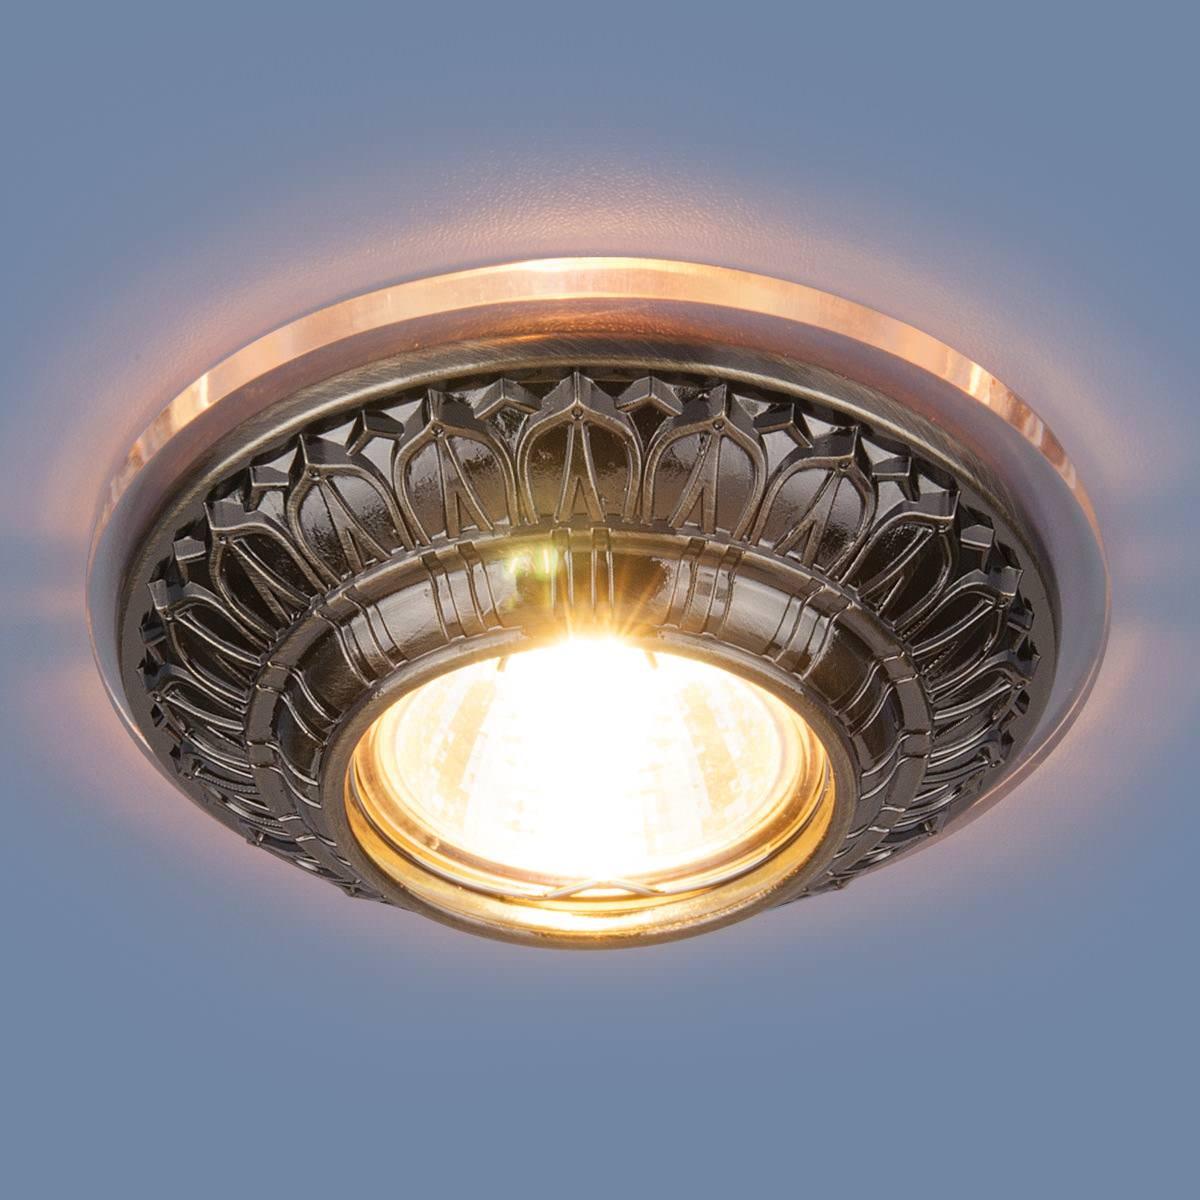 фонари на потолок фото приходом осенне-зимнего